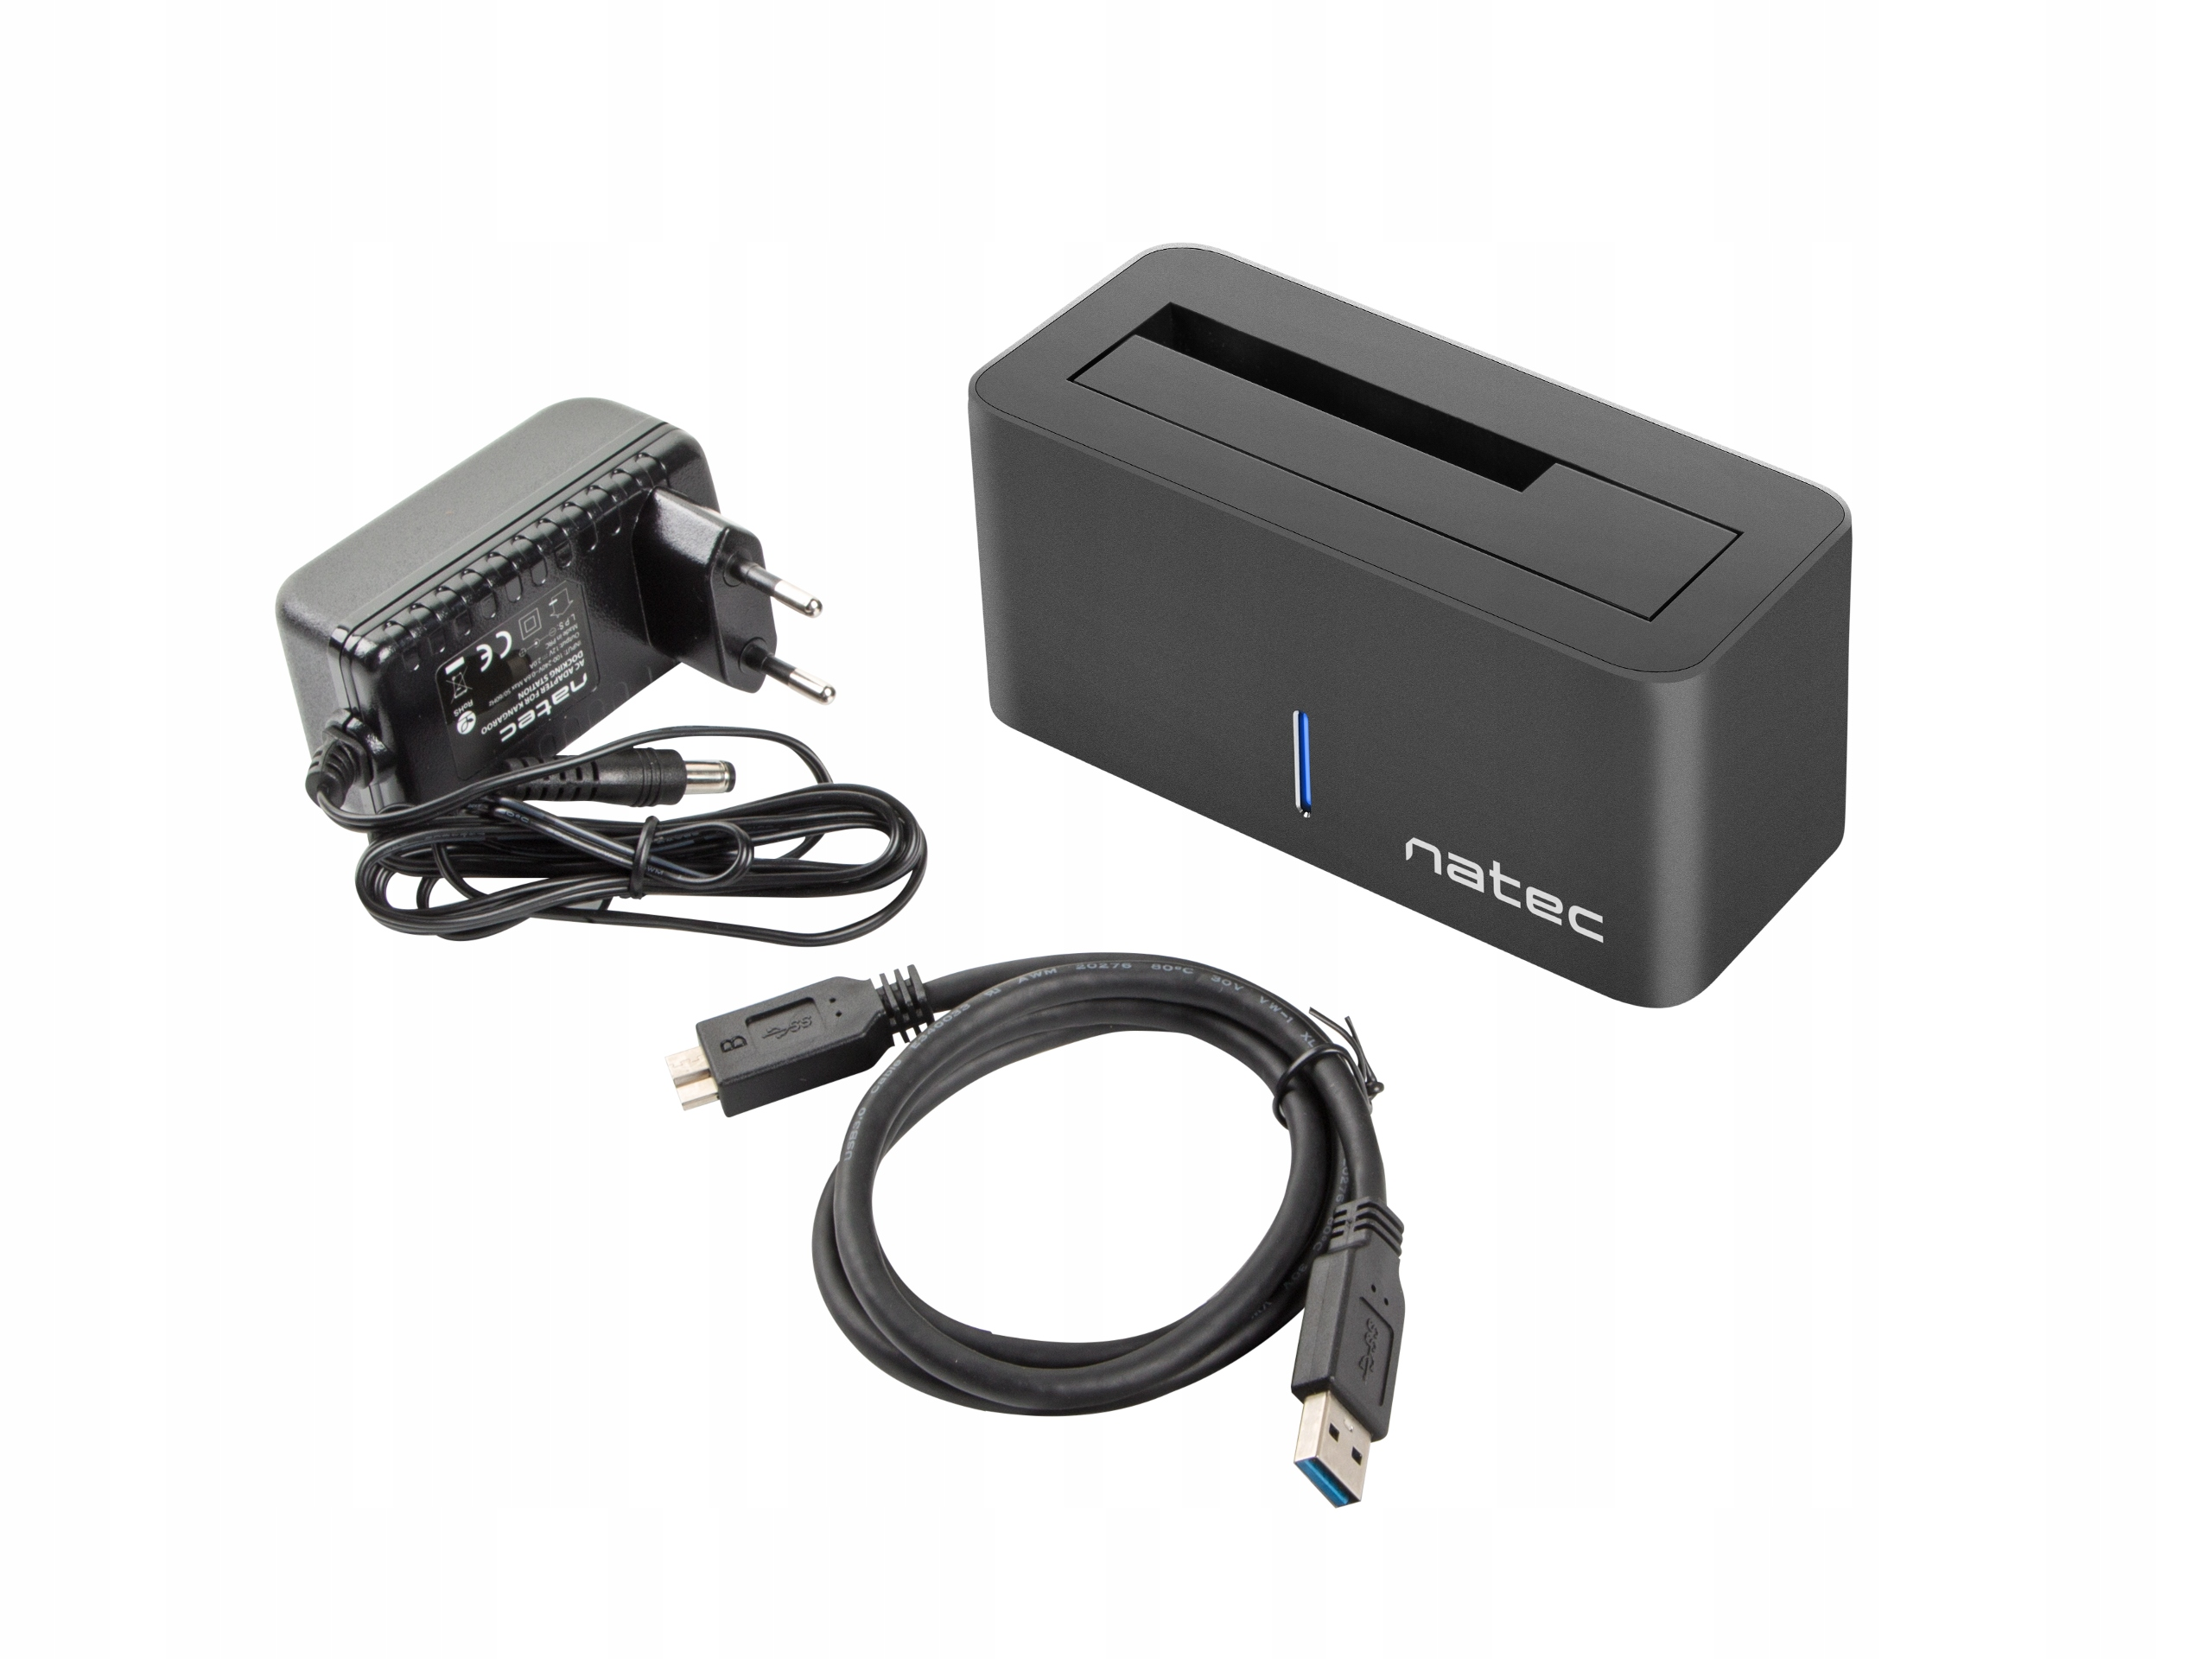 HDD NATEC SATA 2.5 / 3.5 DOCKING STATION 2,5 / 3.5 USB 3.0